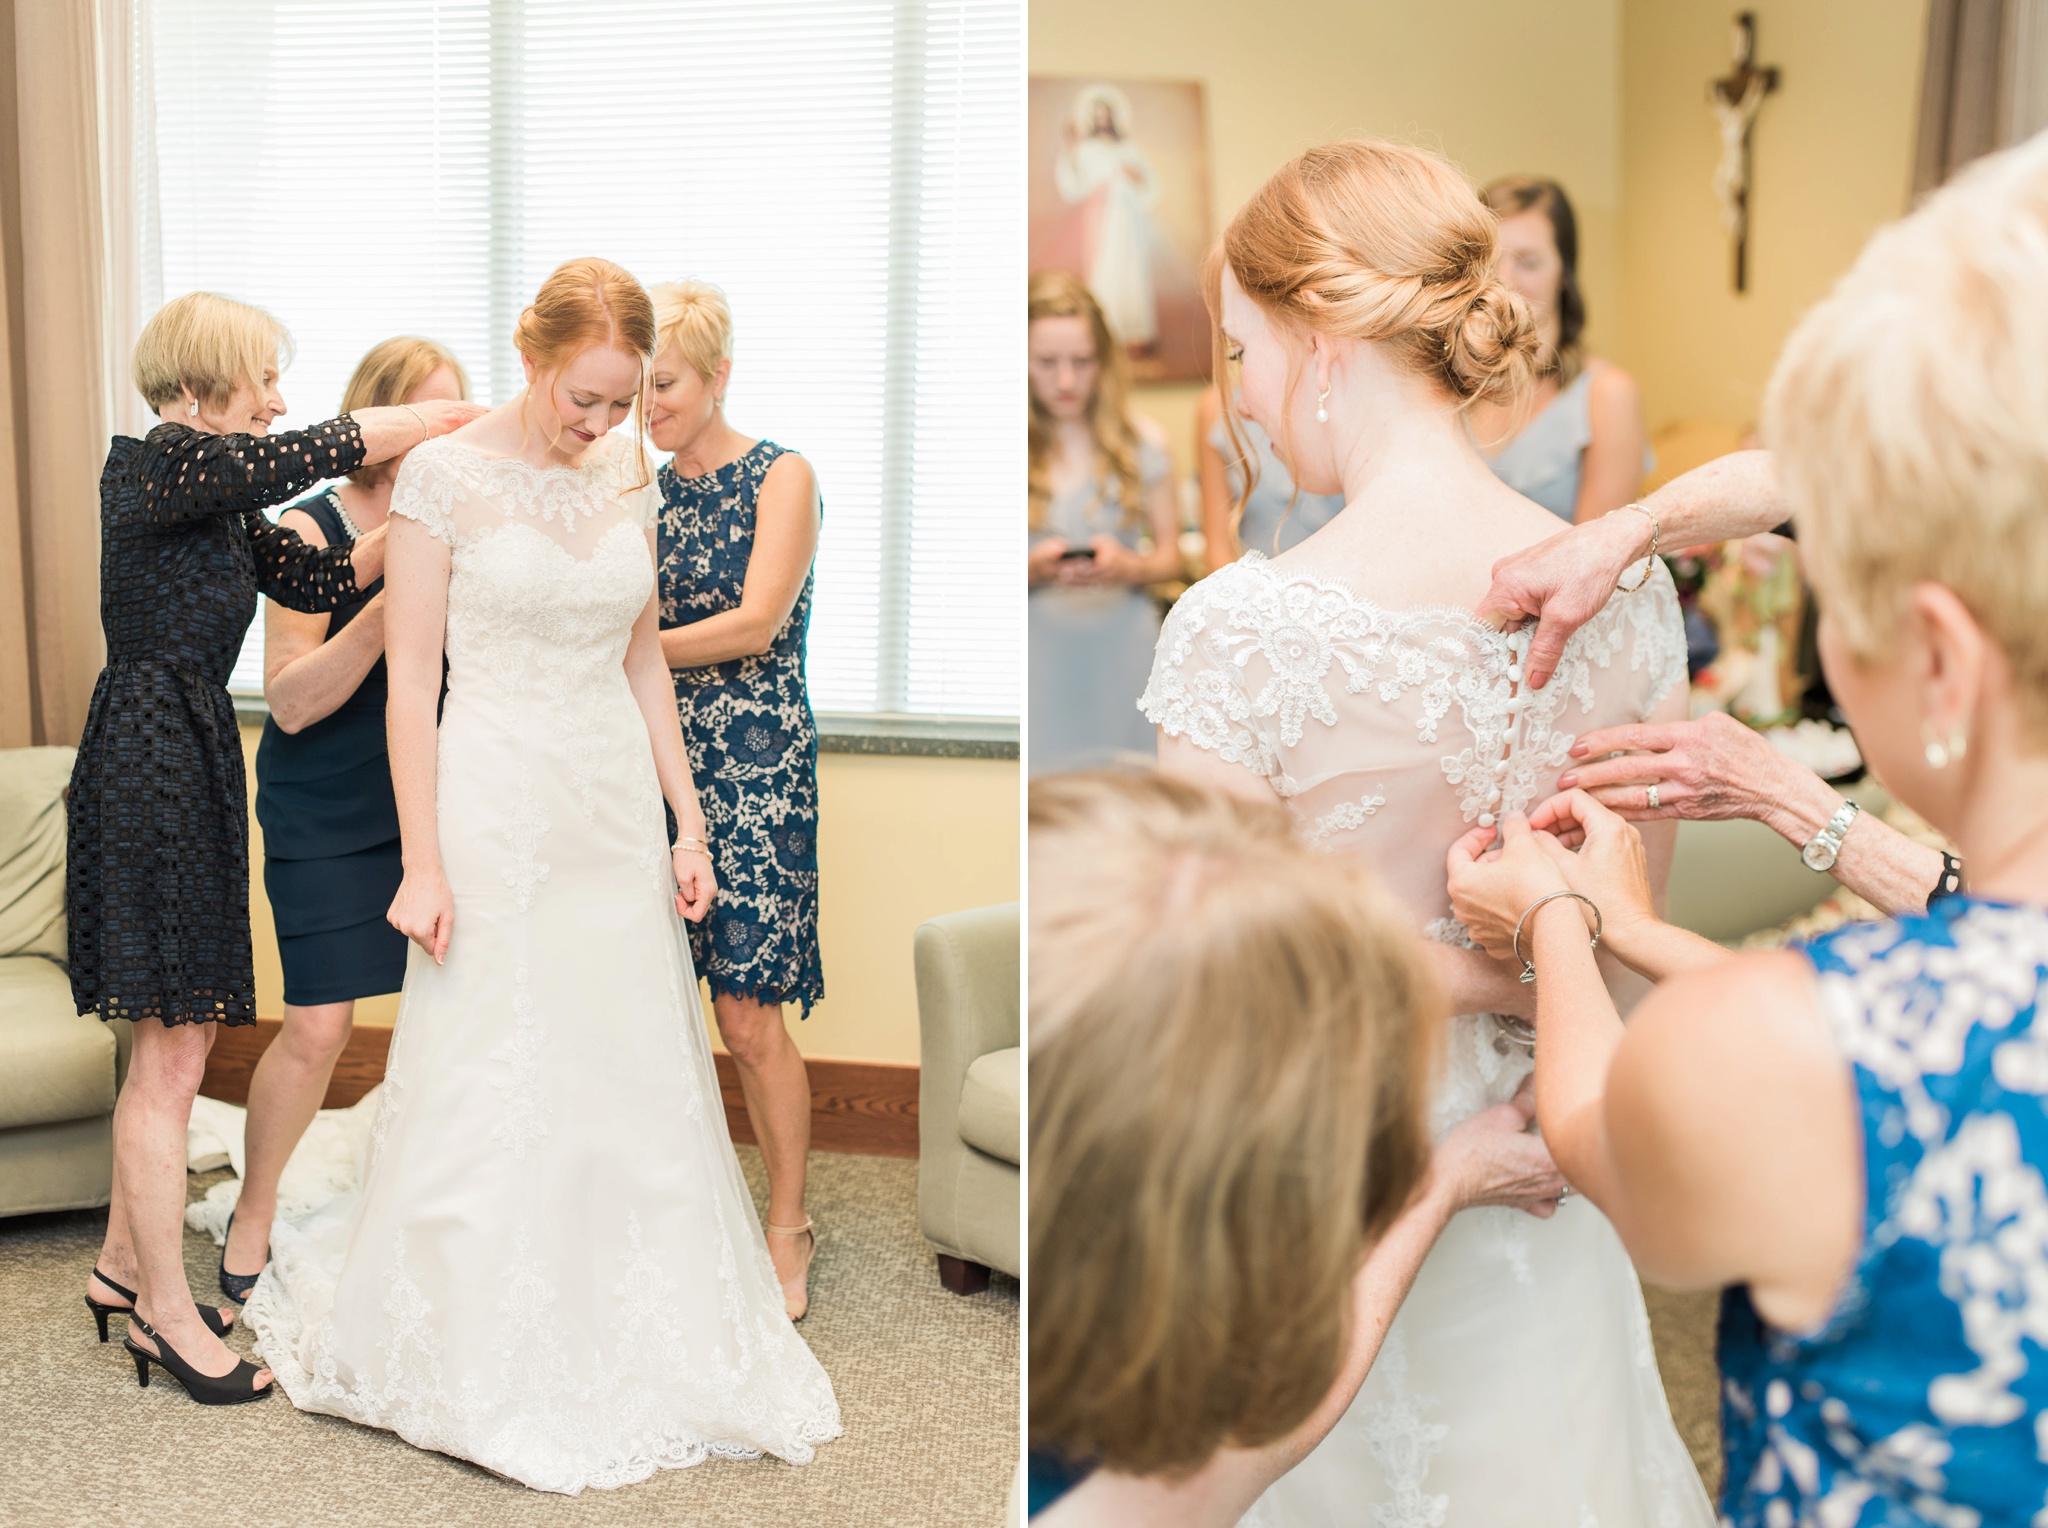 sunbury-ohio-wedding-hannah-johnathan_0017.jpg